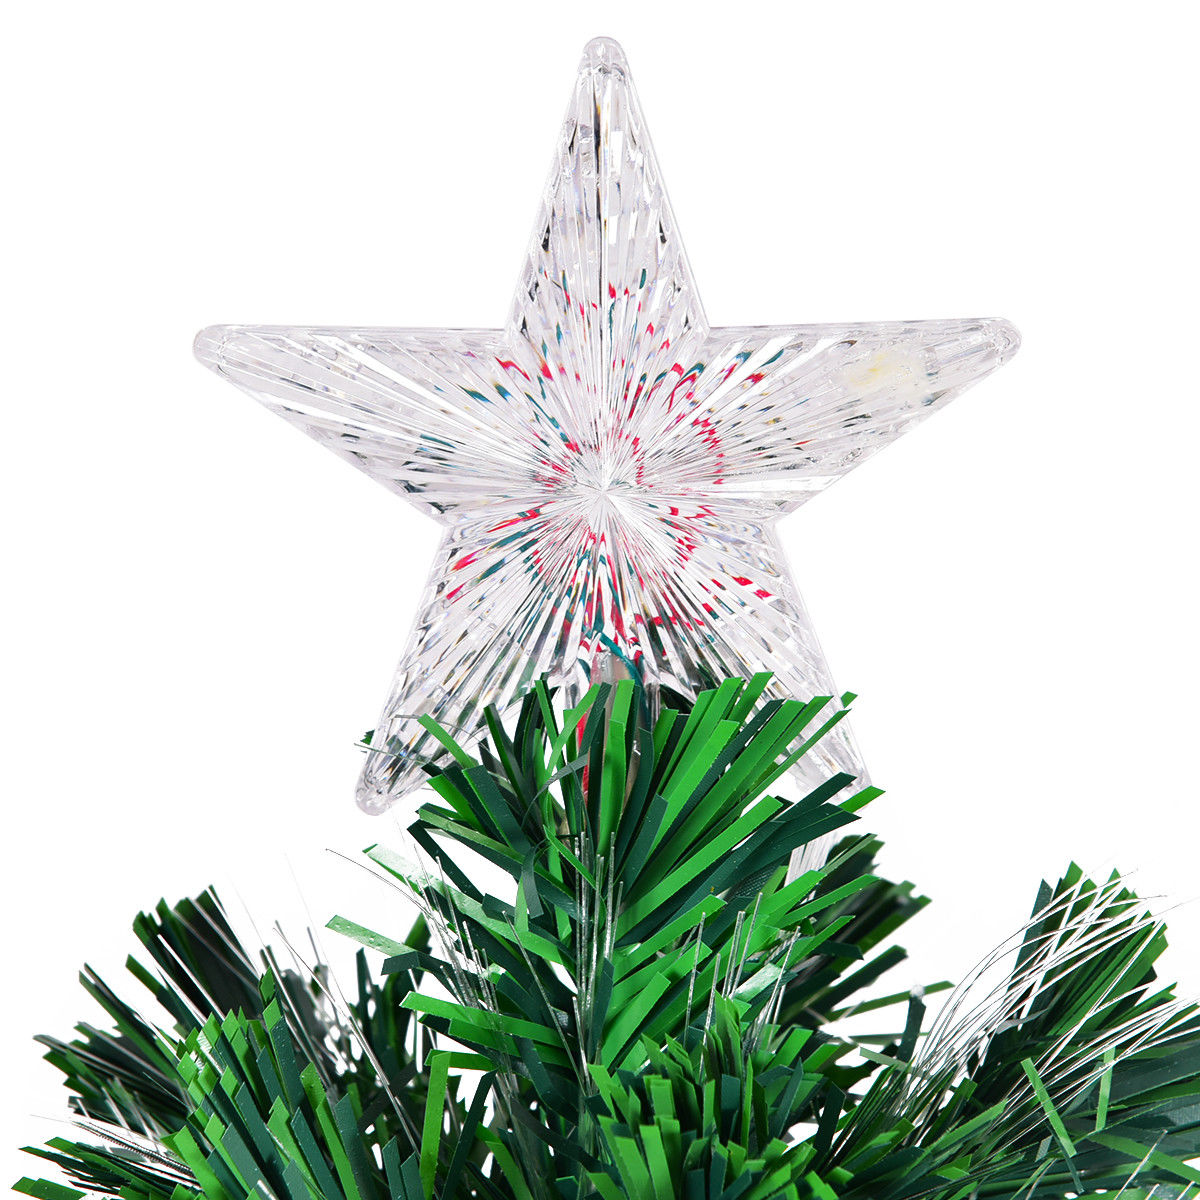 Costway 4FT Pre-Lit Fiber Optic Artificial Christmas Tree w ...